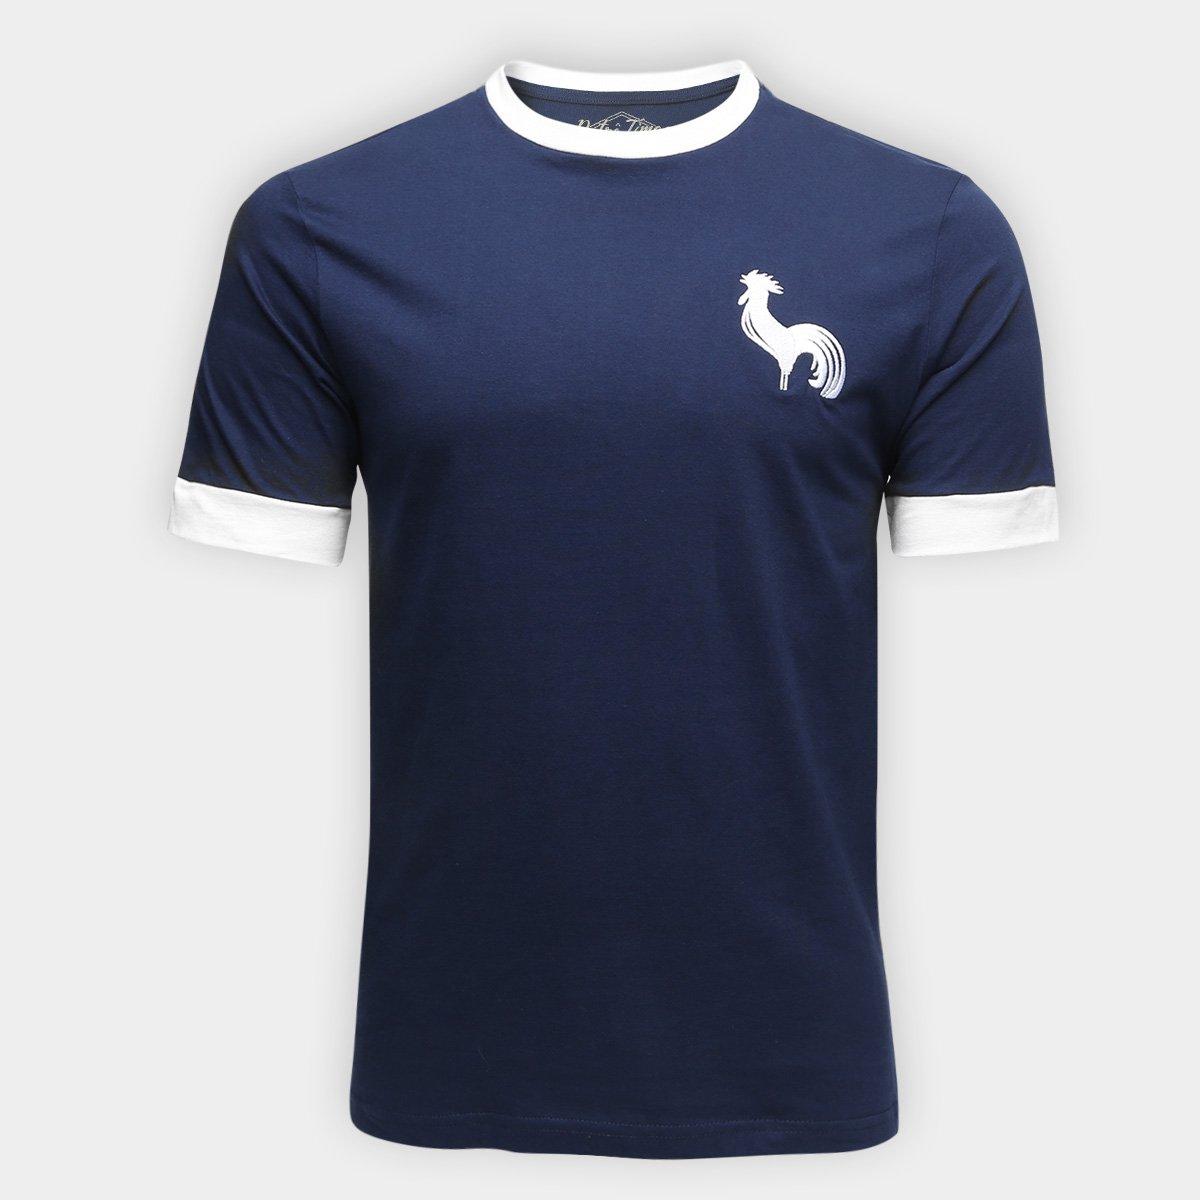 a1c660dac1 Camiseta França Retrô Times Masculina | Netshoes